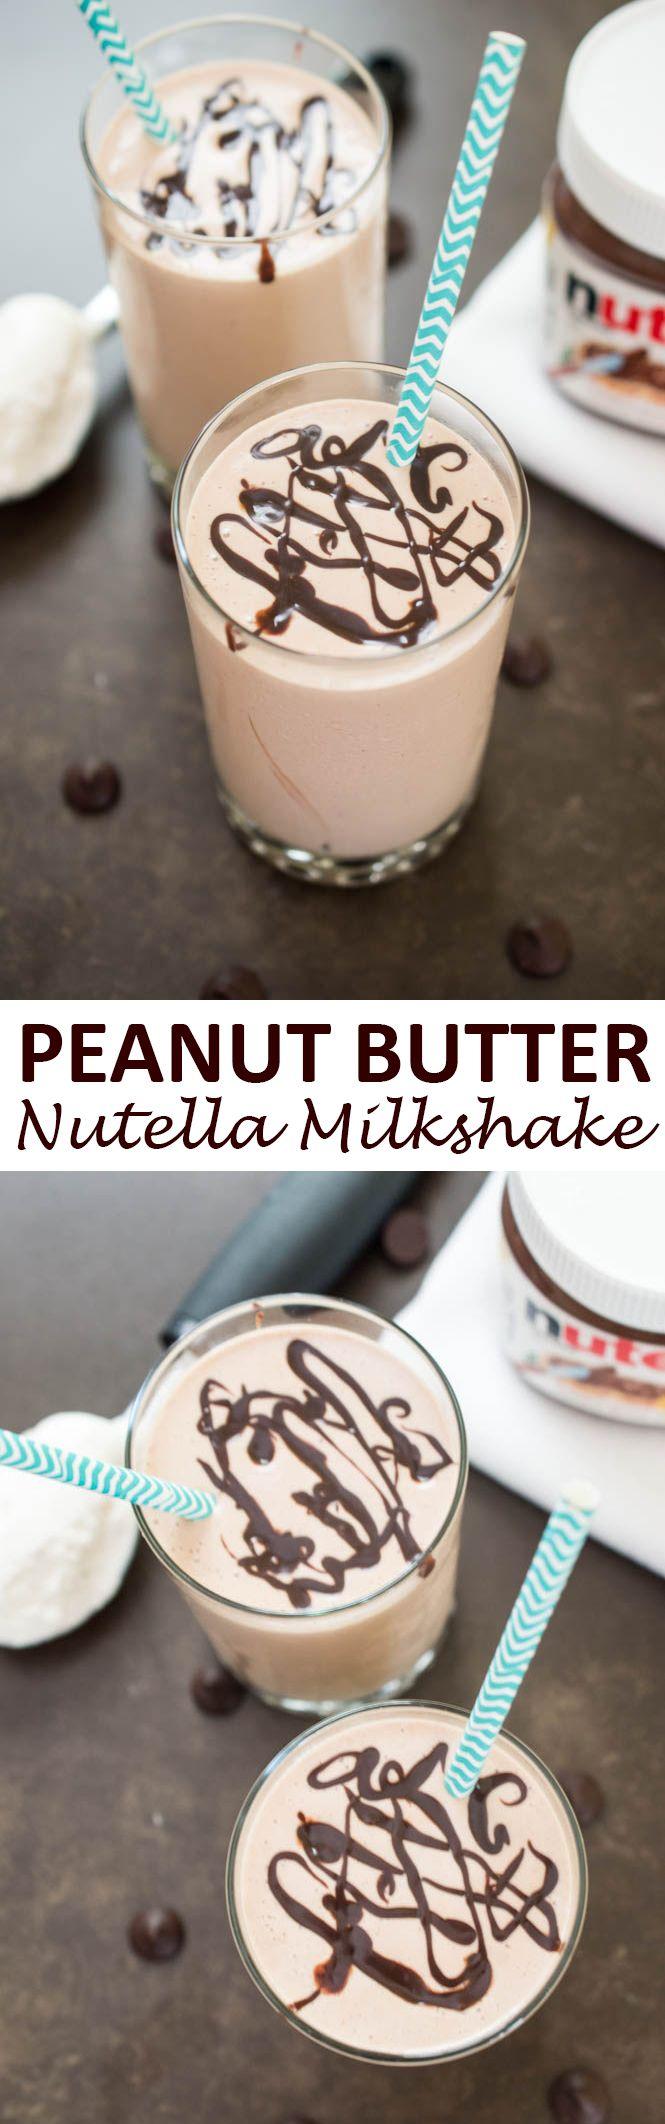 4 ingredient Creamy Peanut Butter & Nutella Milkshake. Takes less than 5 minutes to make!   chefsavvy.com #recipe #milkshake #dessert #chocolate